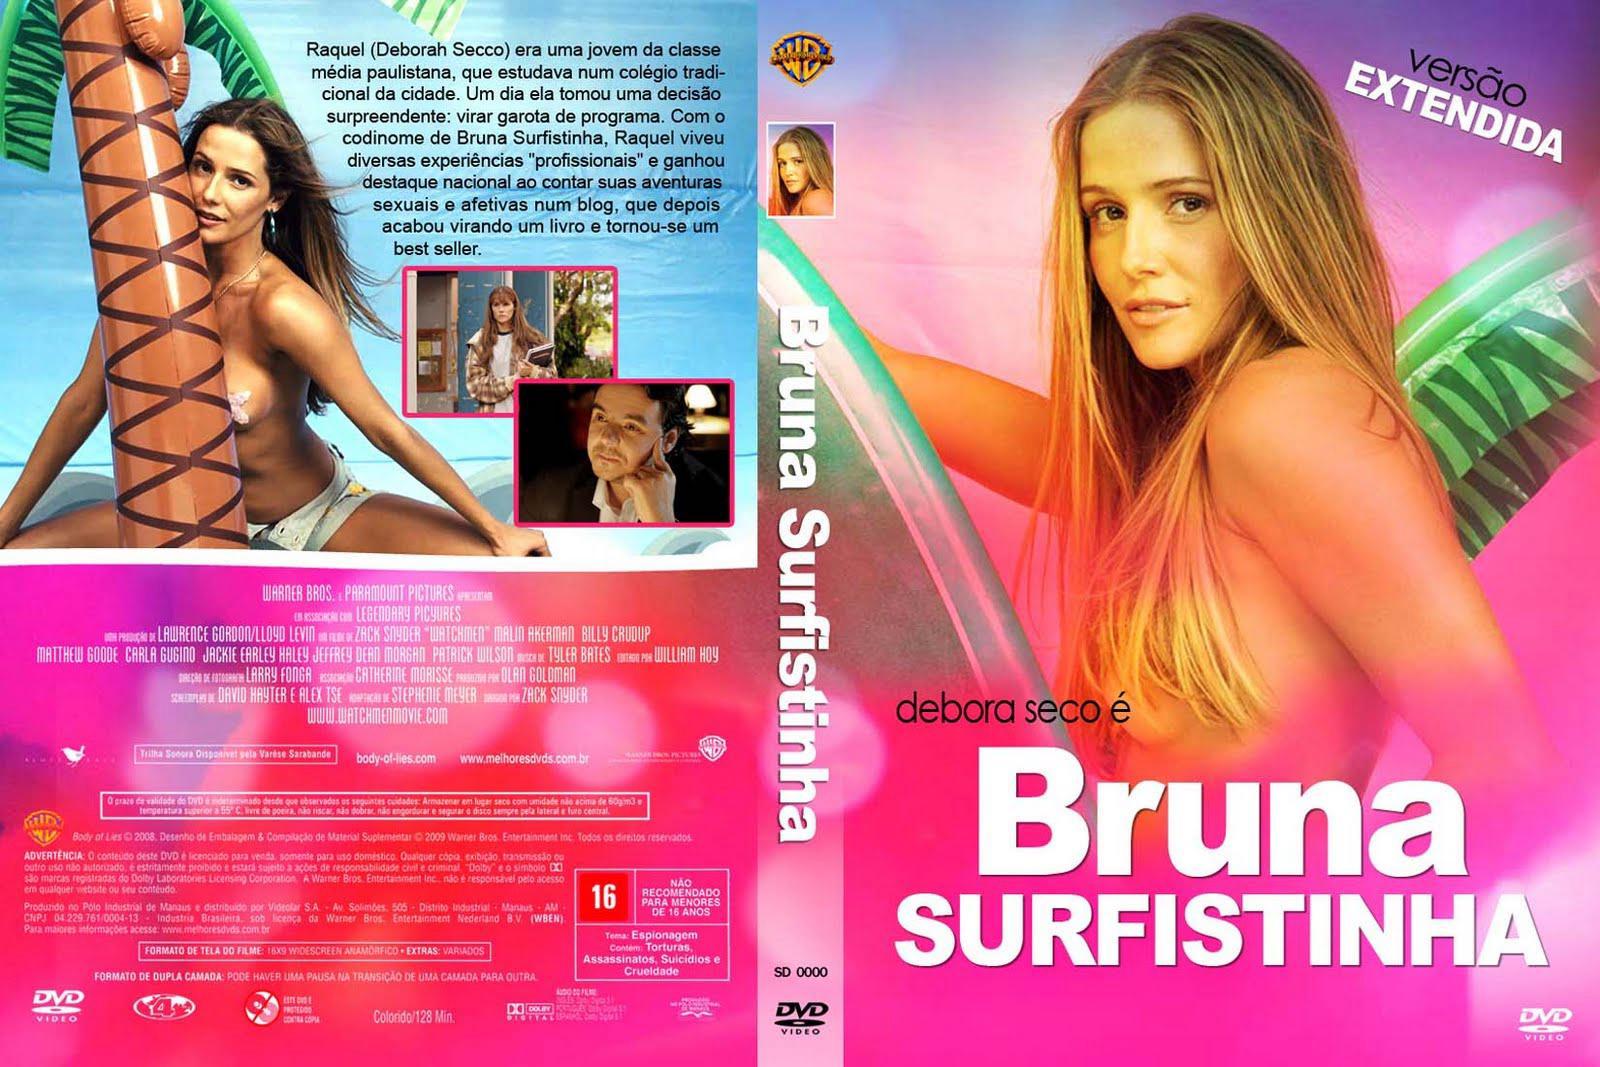 Bruna surfistinha 2011 filme completo hd online httpsadsrtmeuxtu89c - 1 8